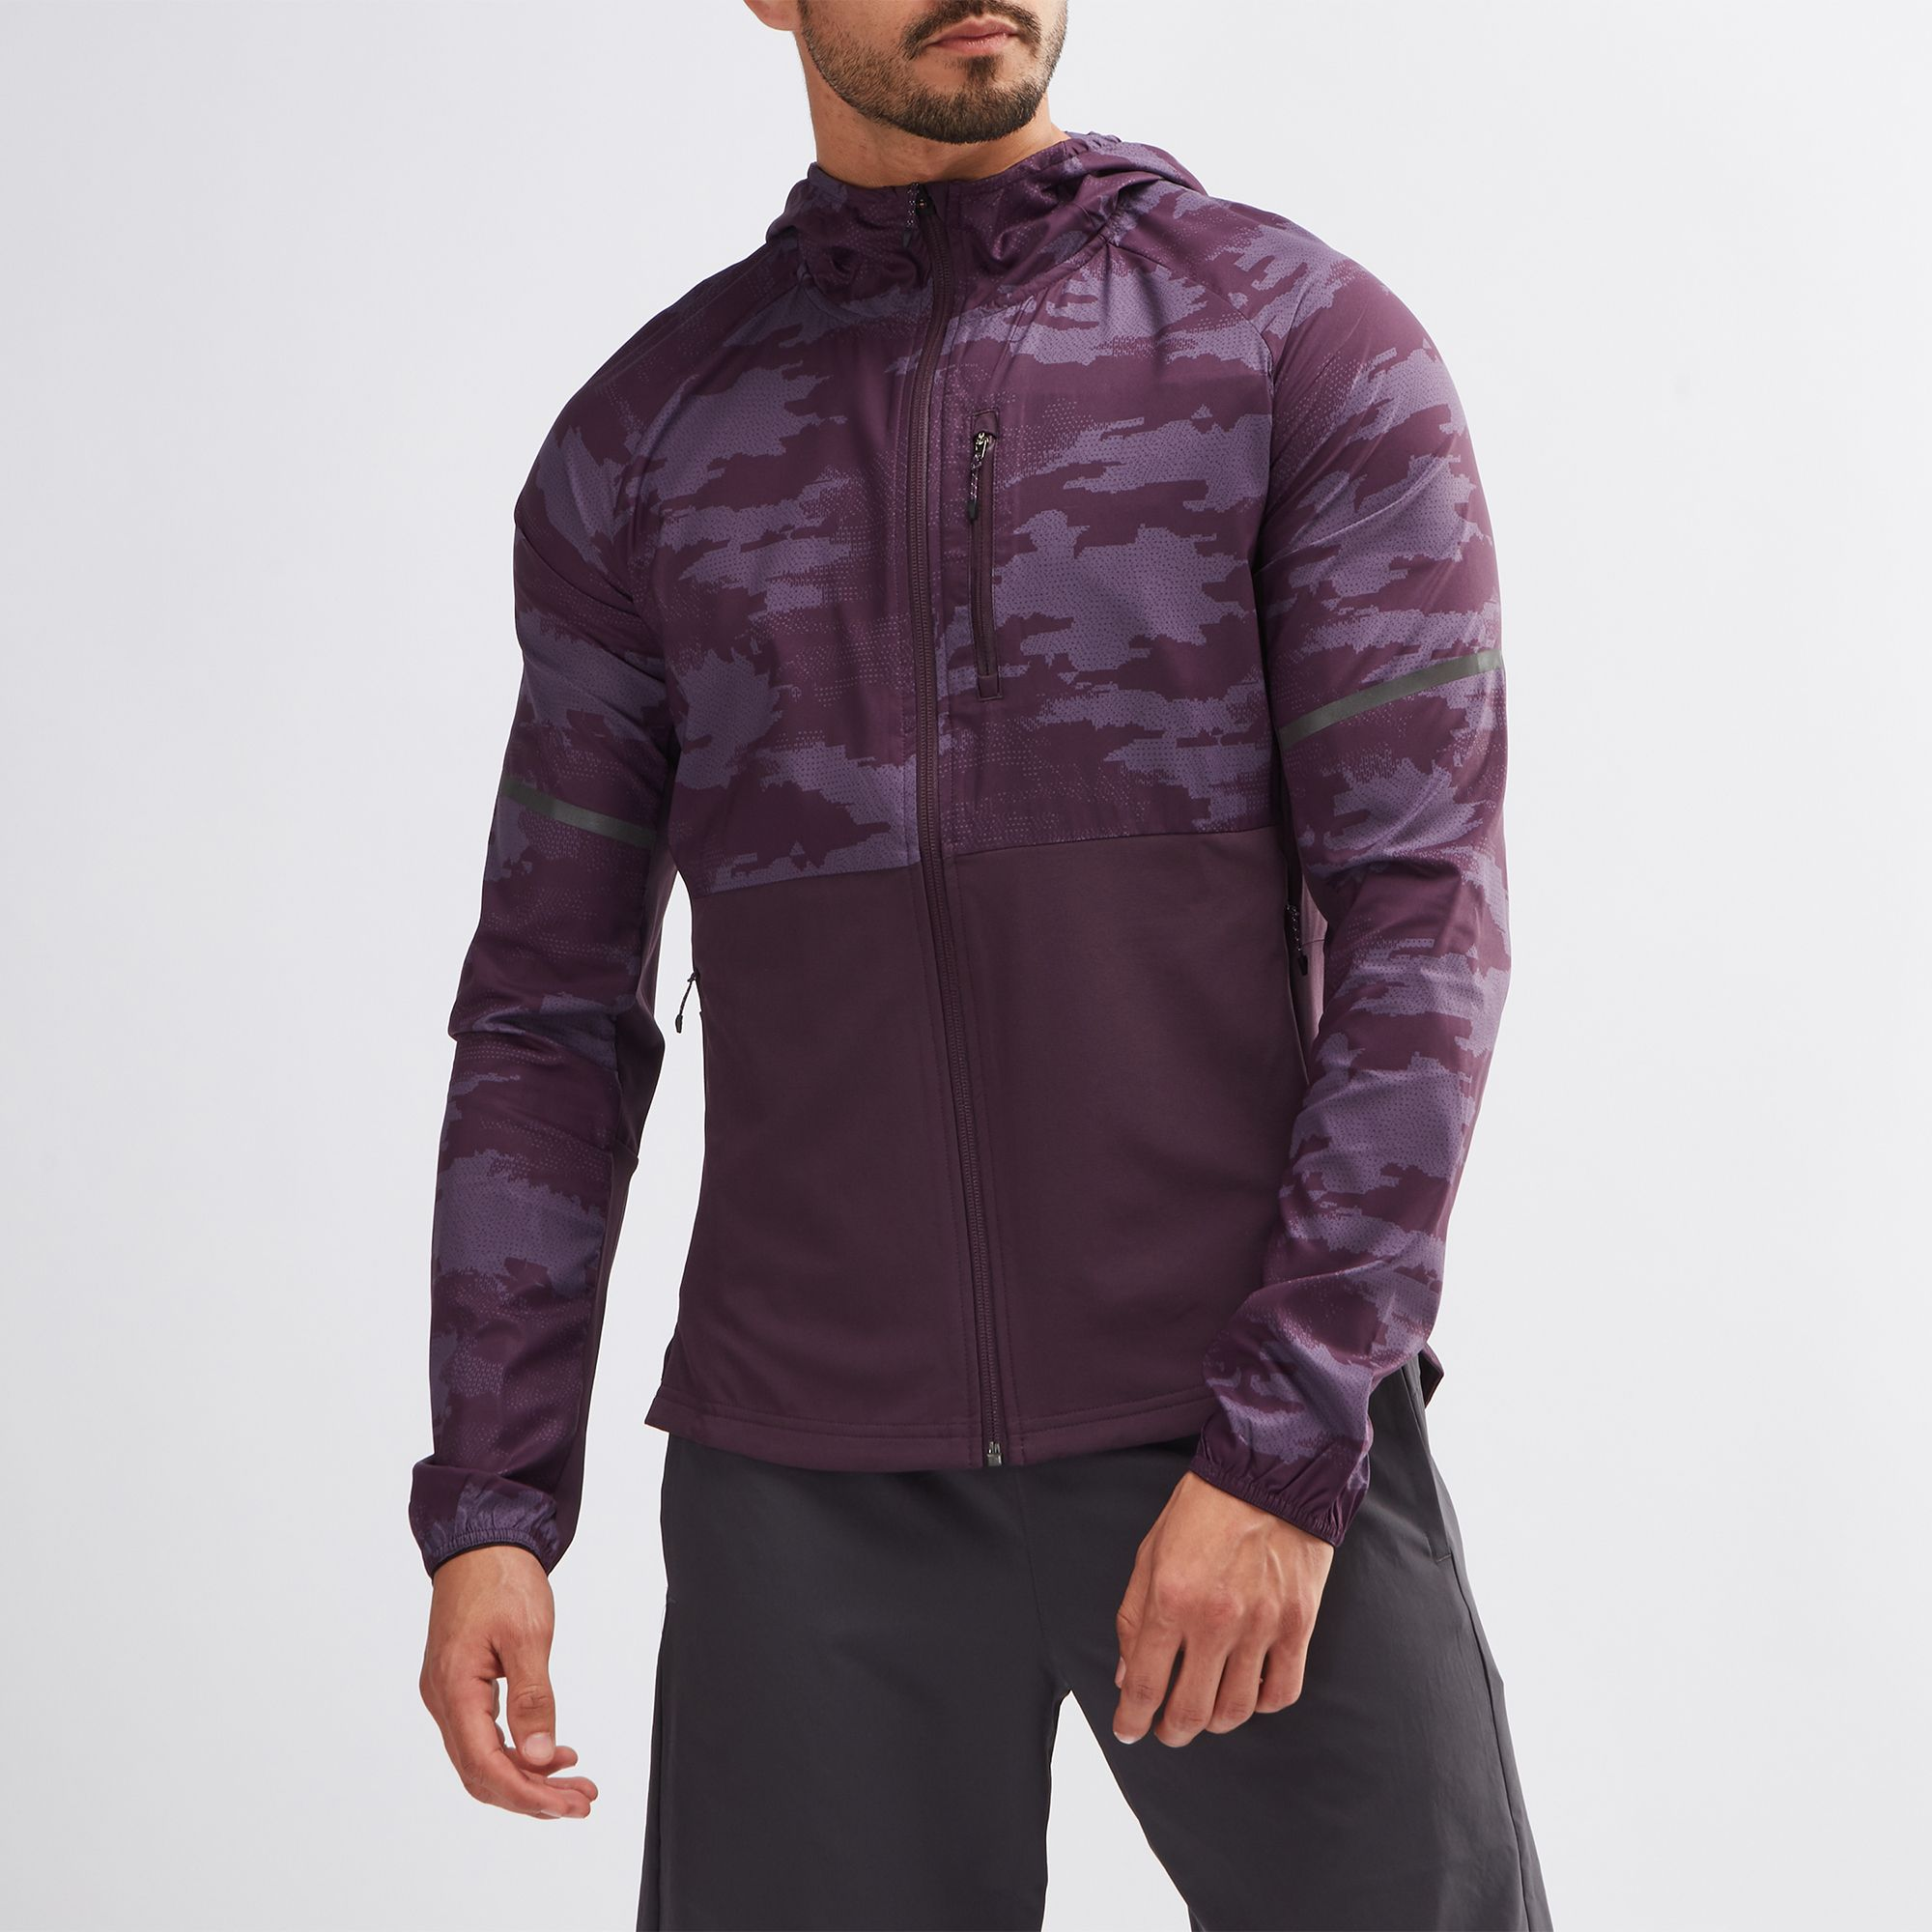 adidas Ultra Graphic Running Jacket   Jackets   Clothing